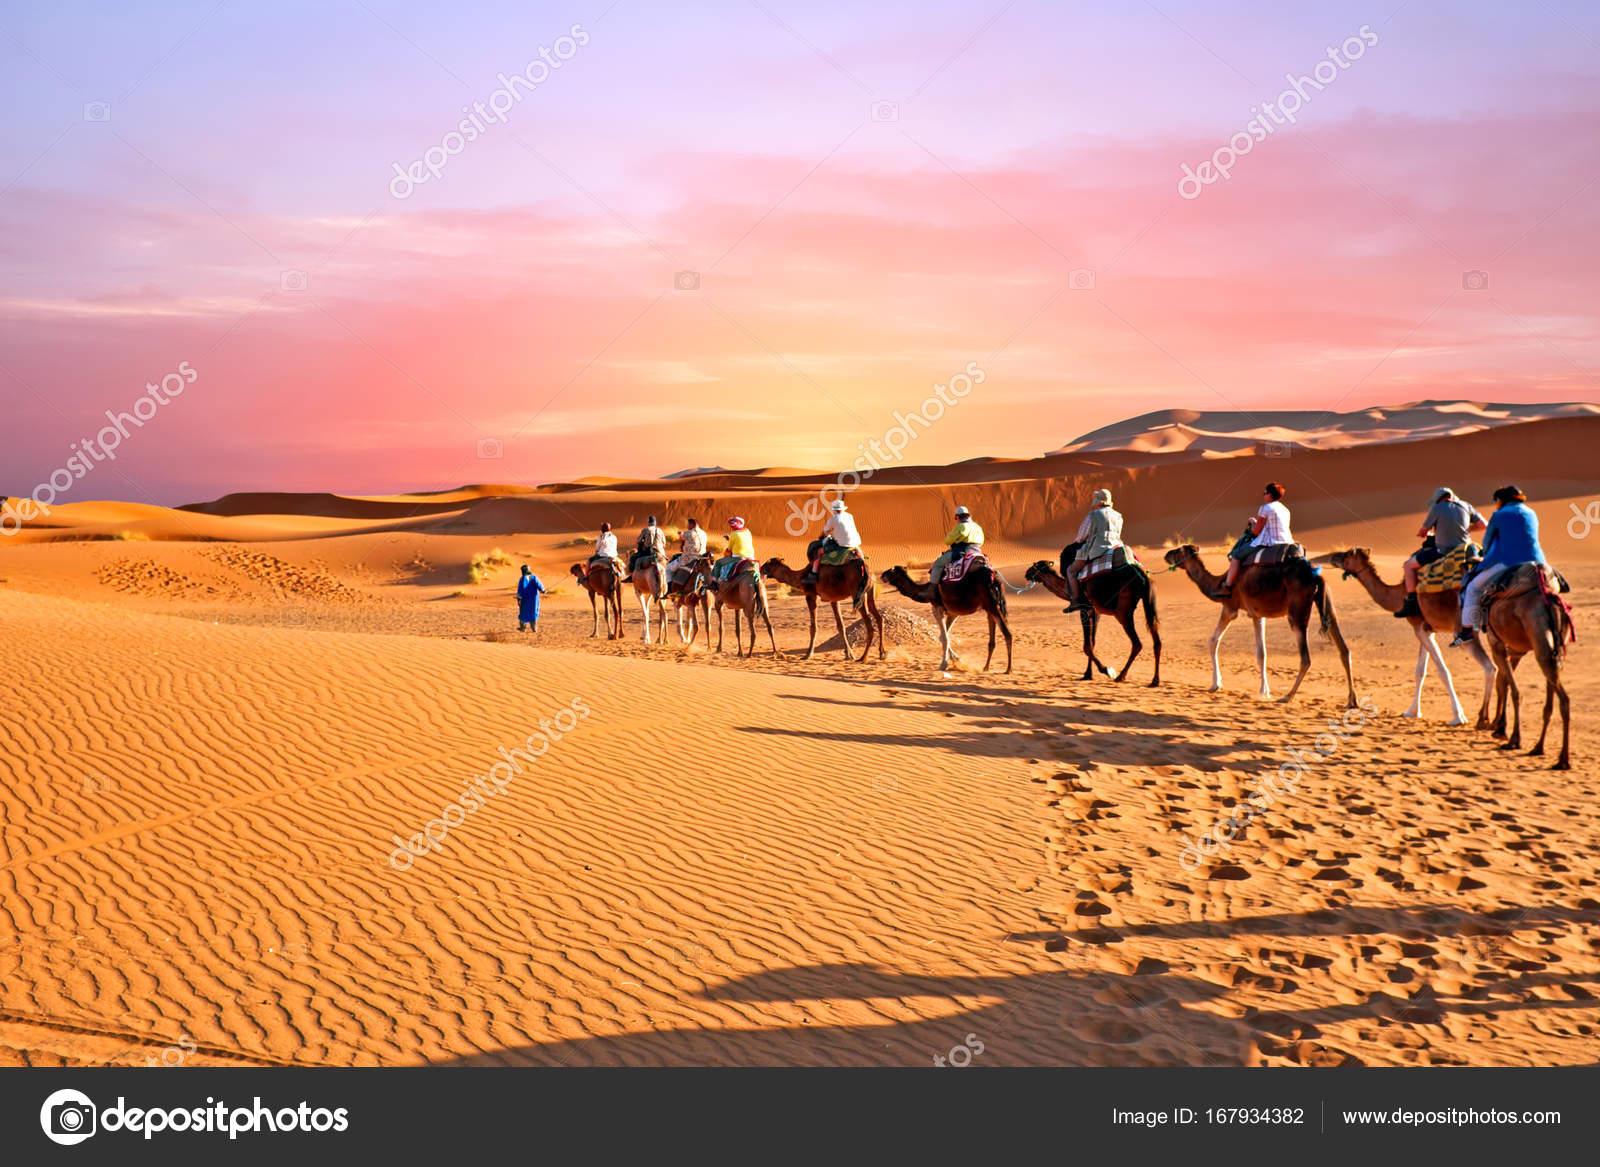 https://st3.depositphotos.com/1640238/16793/i/1600/depositphotos_167934382-stock-photo-camel-caravan-going-through-the.jpg